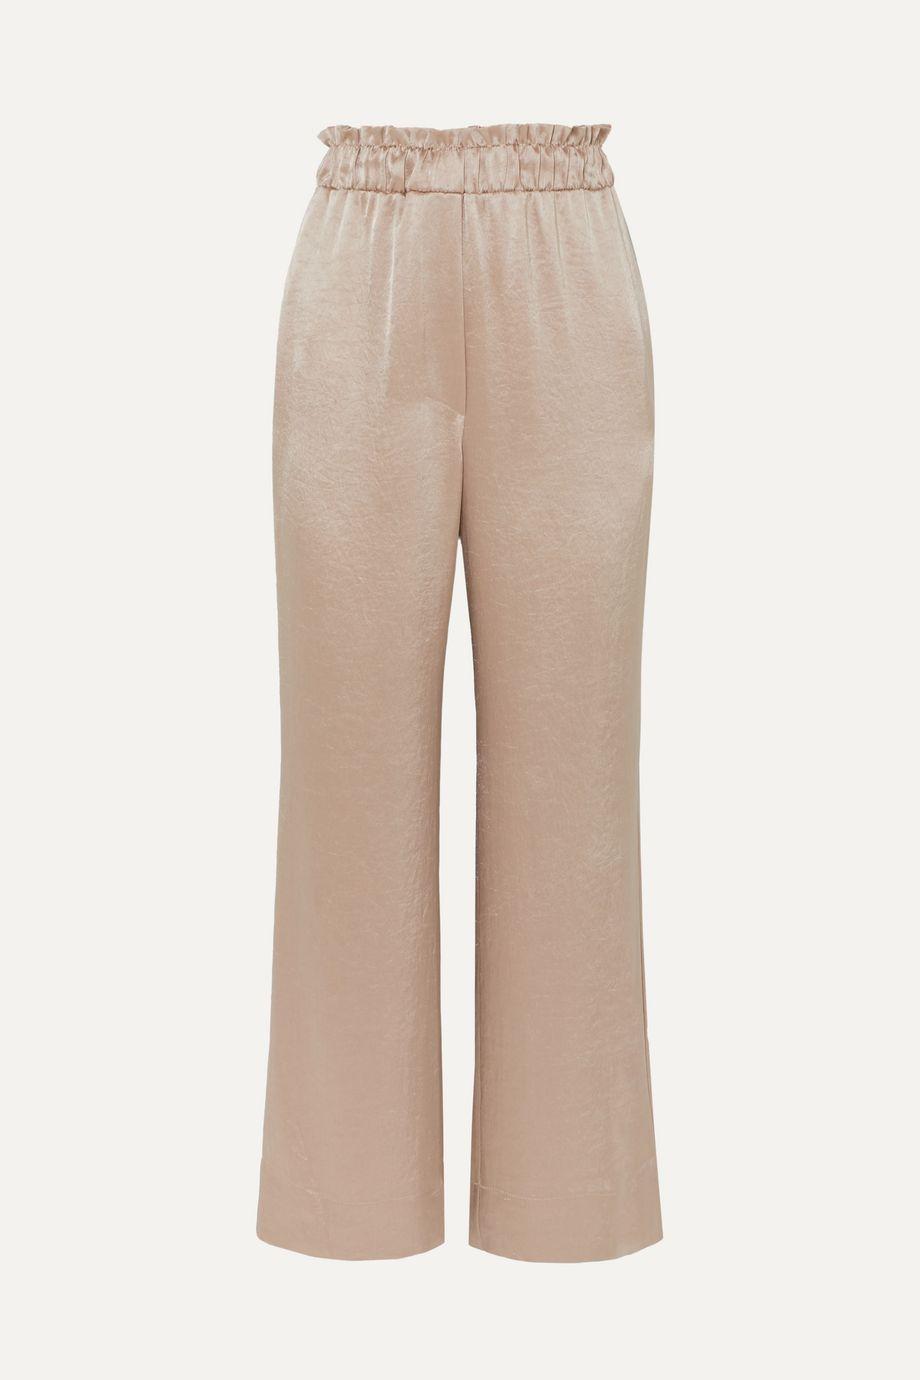 Nanushka Ming hammered-satin wide-leg pants